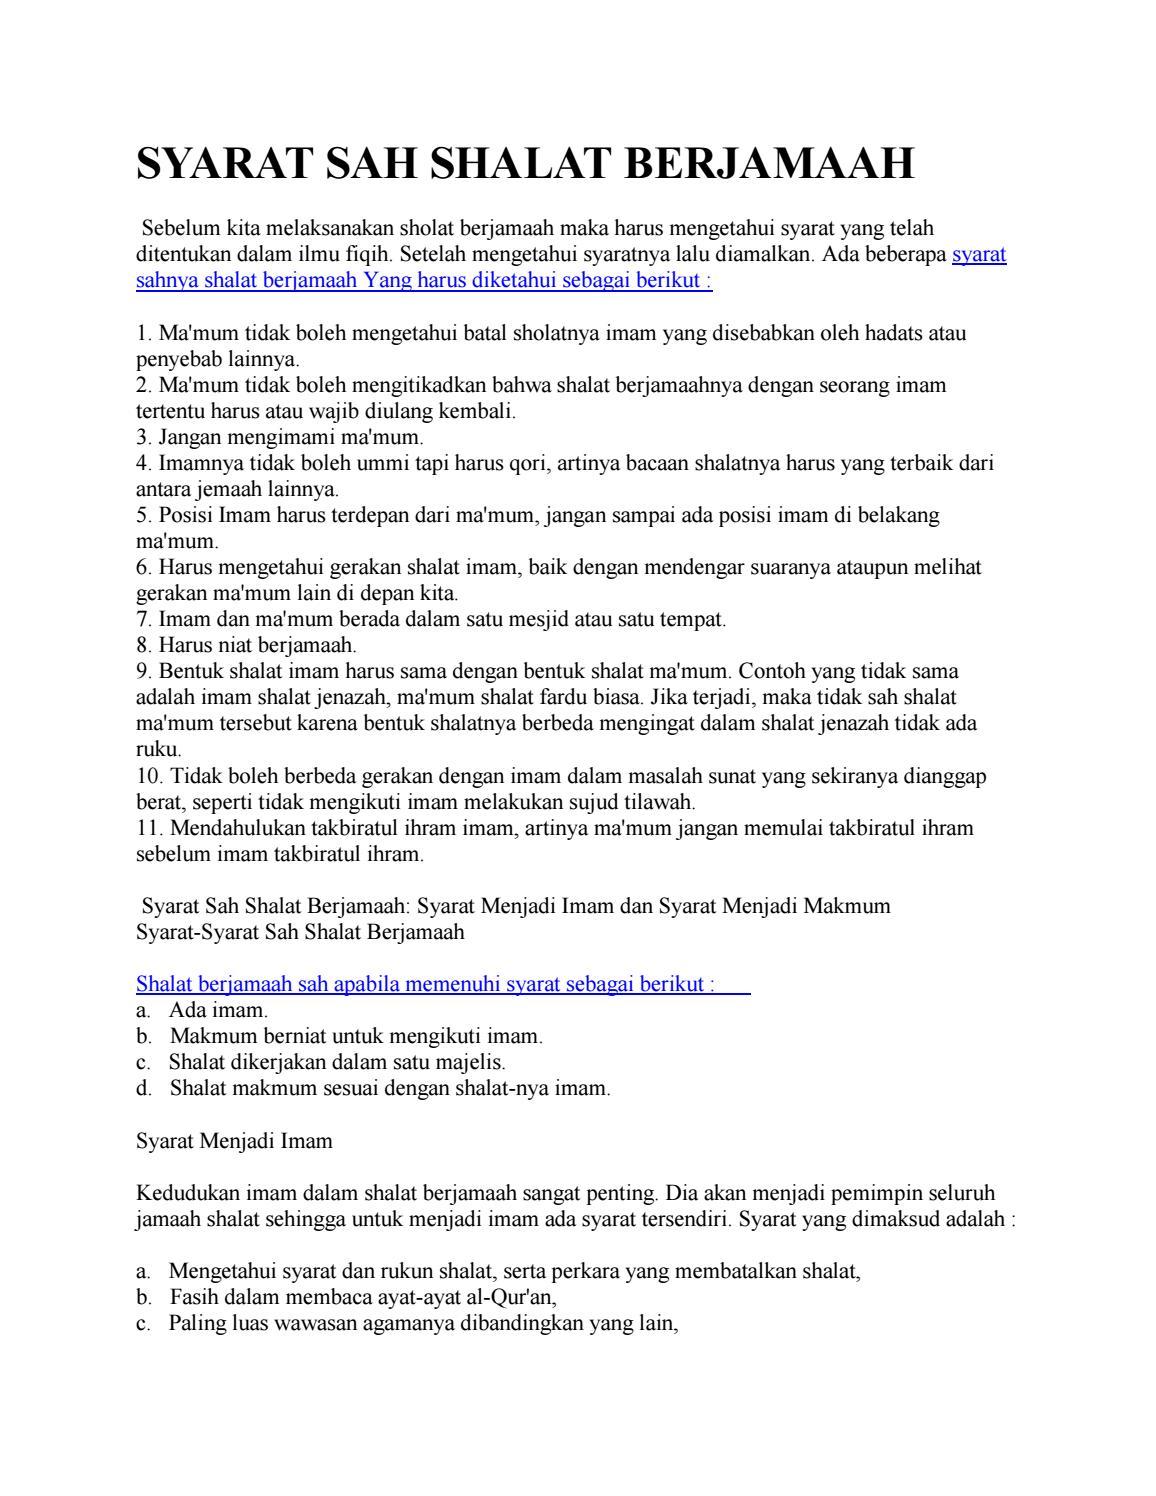 Syarat Sah Shalat Berjamaah By Mar Bawi Issuu